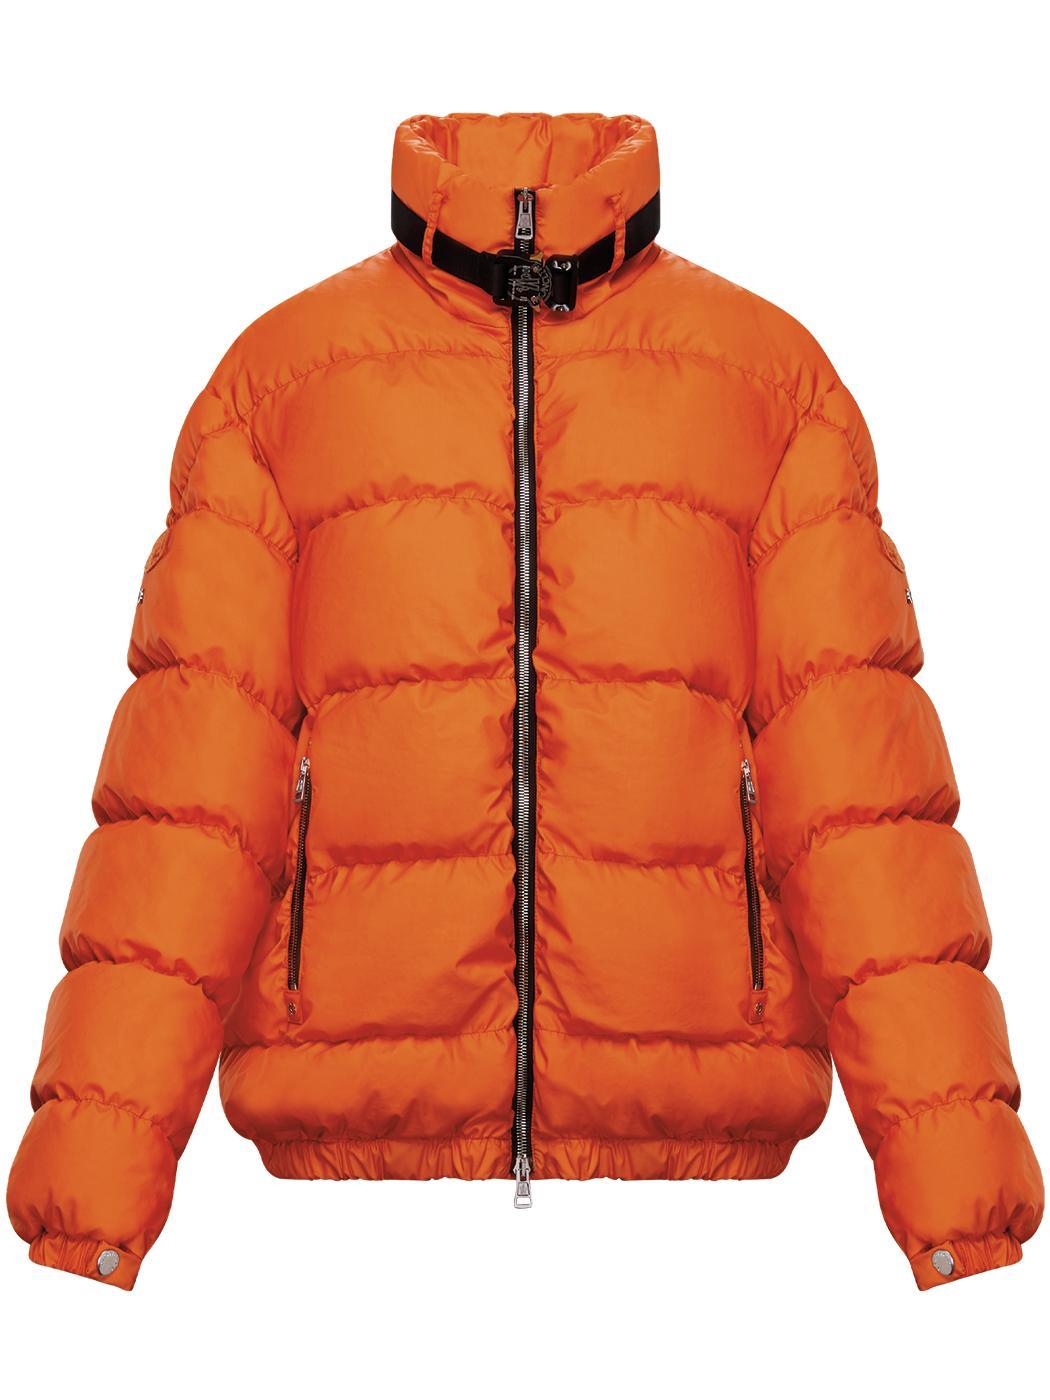 Cotton Down Jacket